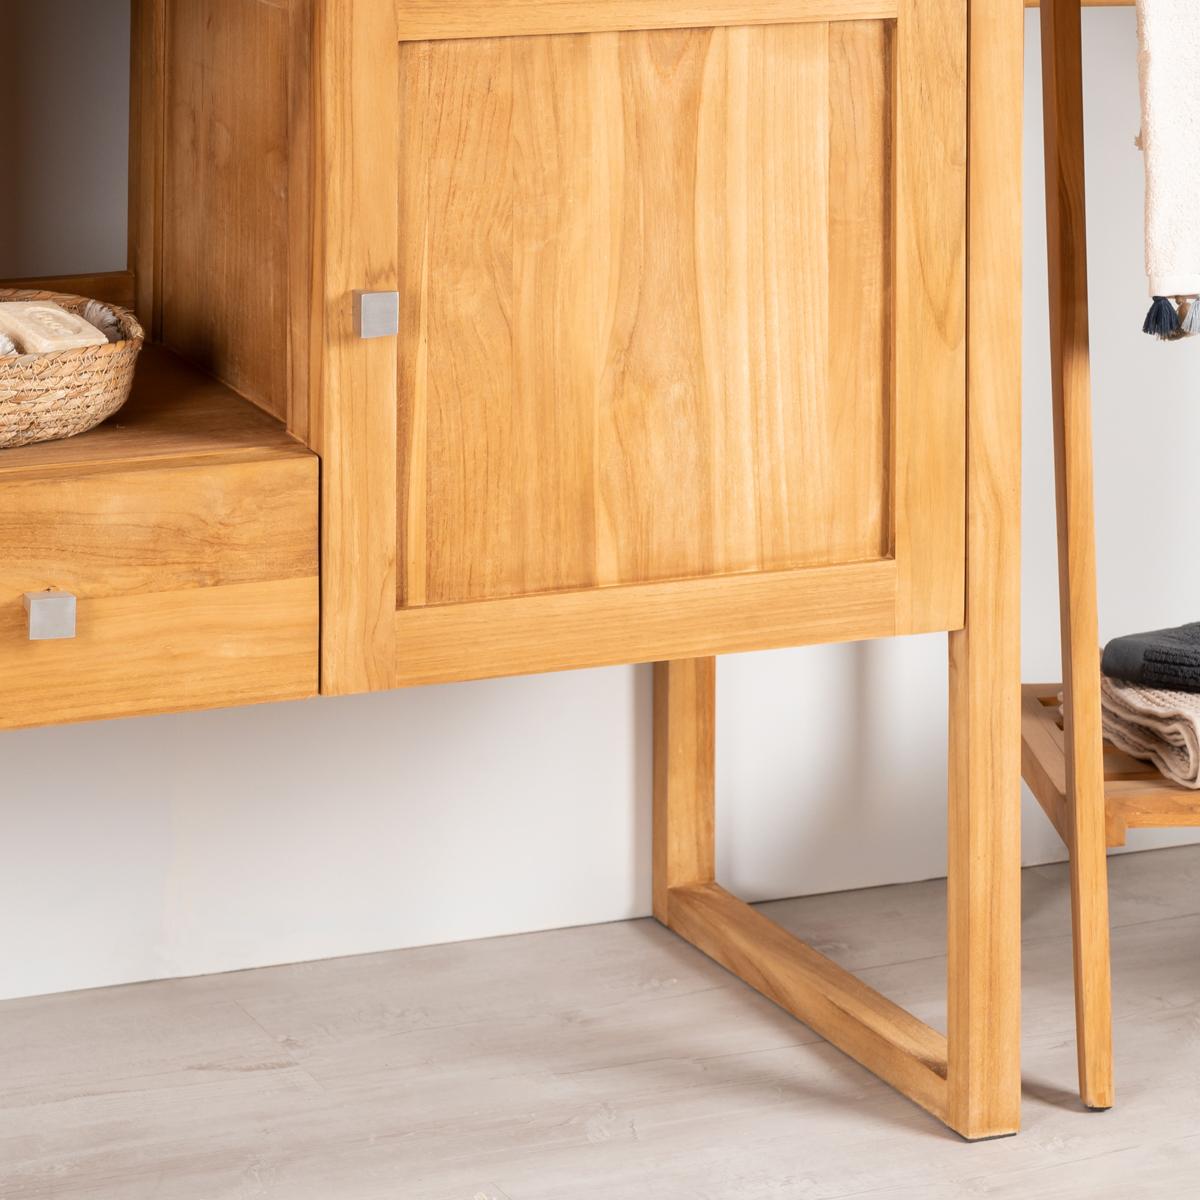 Mueble lavabo : Mueble de cuarto de baño, teca, 130 cm, THEA